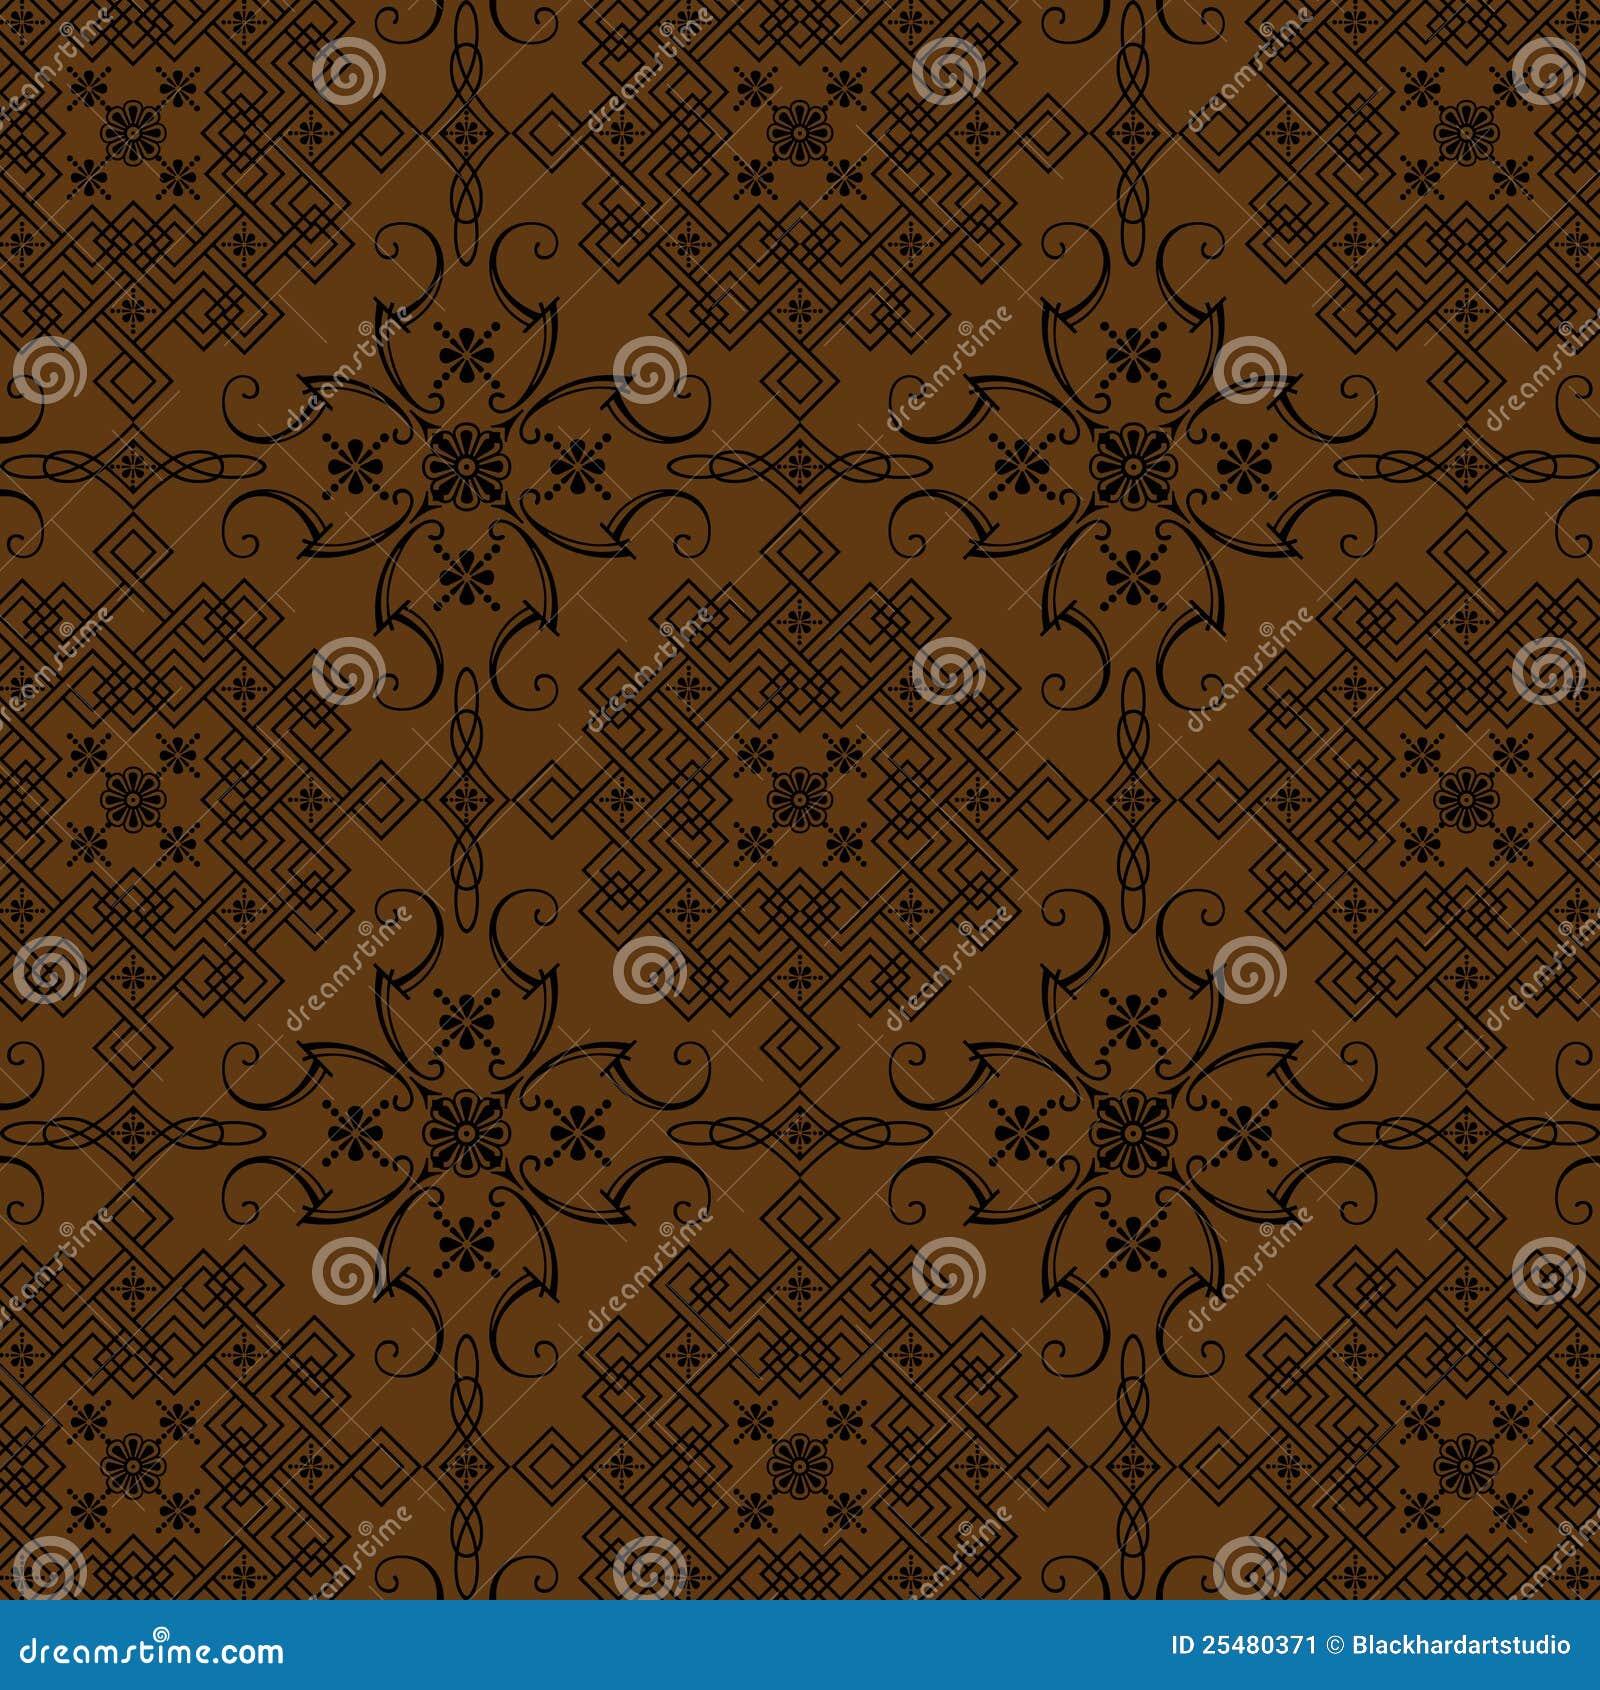 vintage floral brown css html brown flowers vintage style wallpaper stock image image